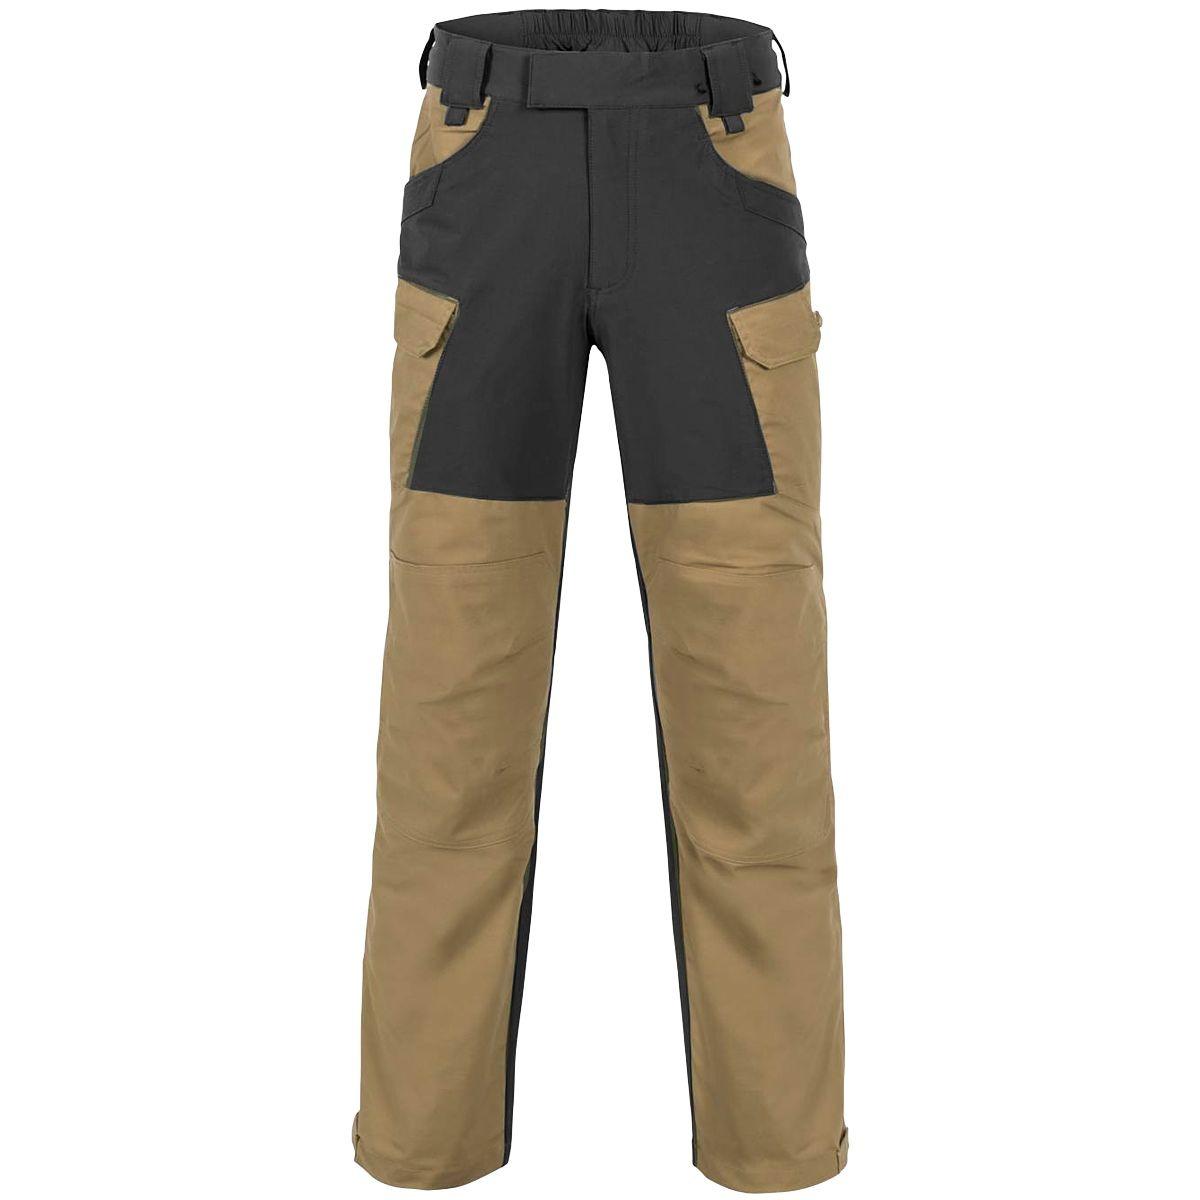 Helikon-Tex®  HYBRID OUTBACK PANTS®  DURACANVAS® - Coyote / BLACK